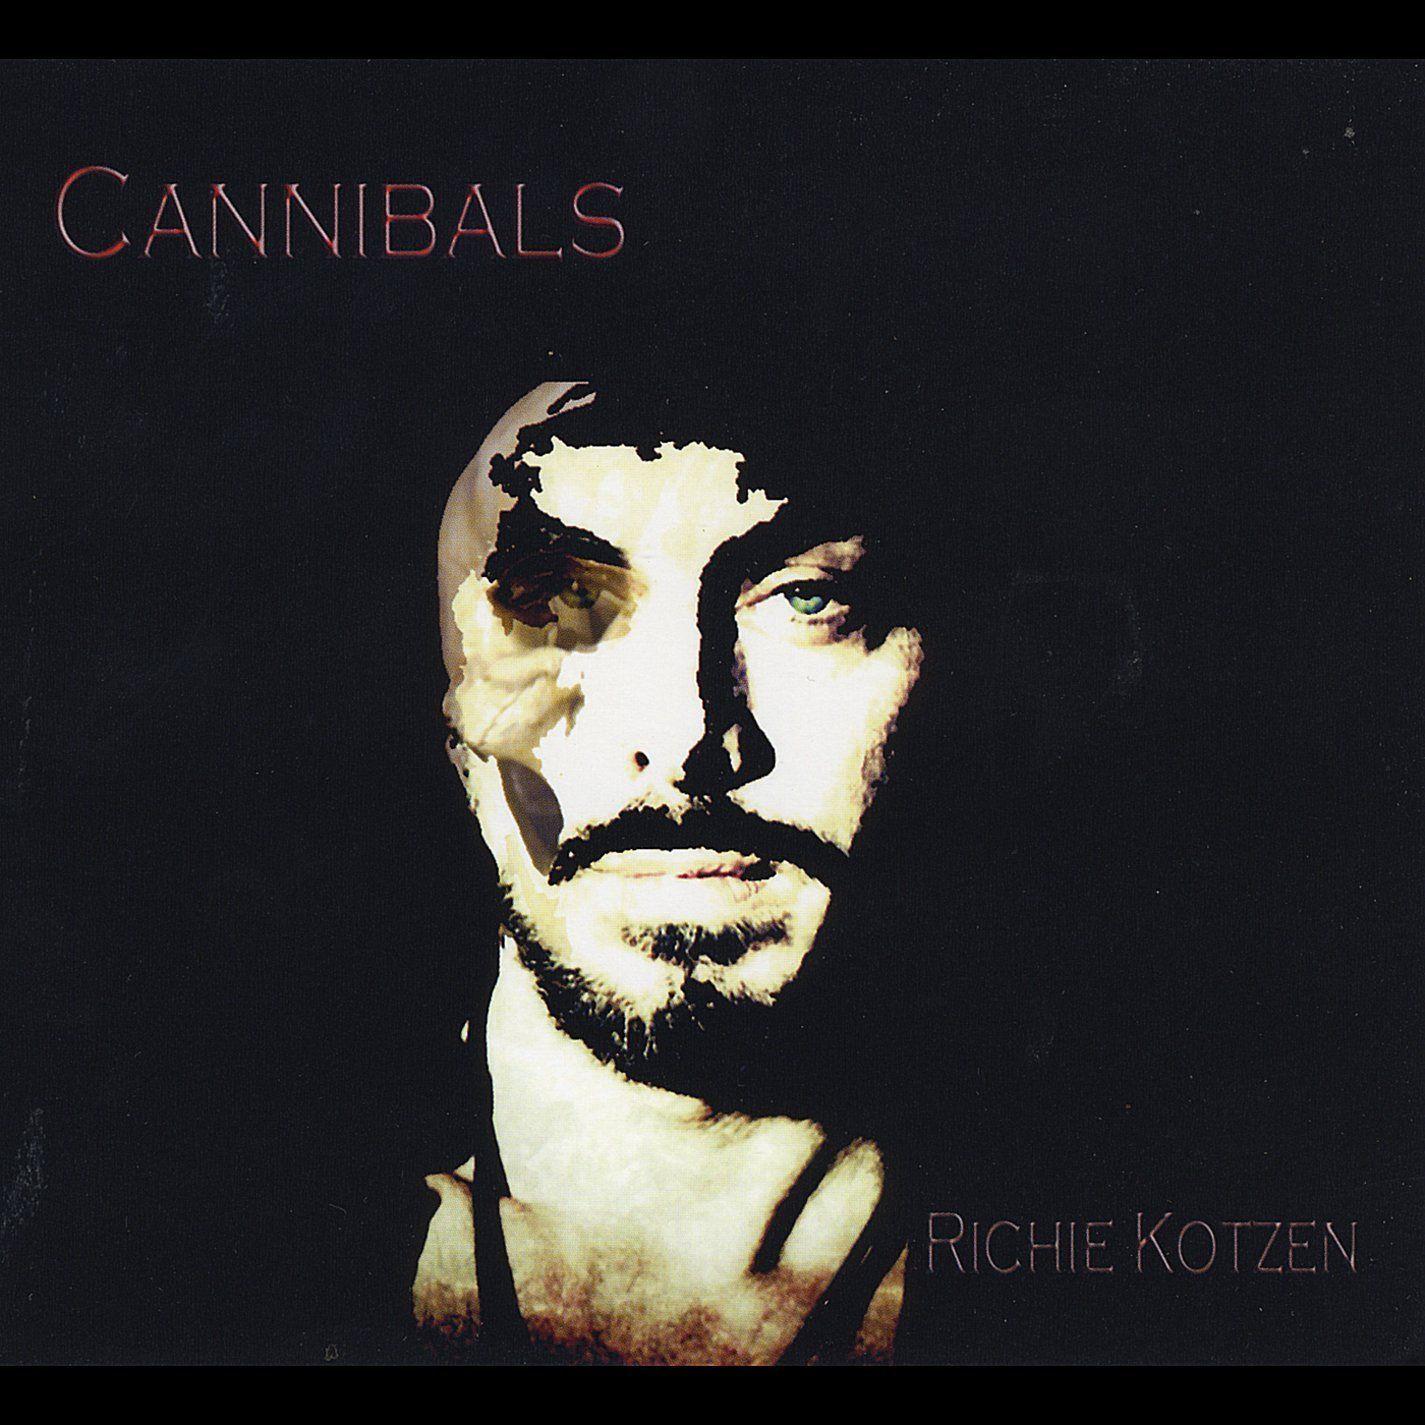 Richie Kotzen - Cannibals